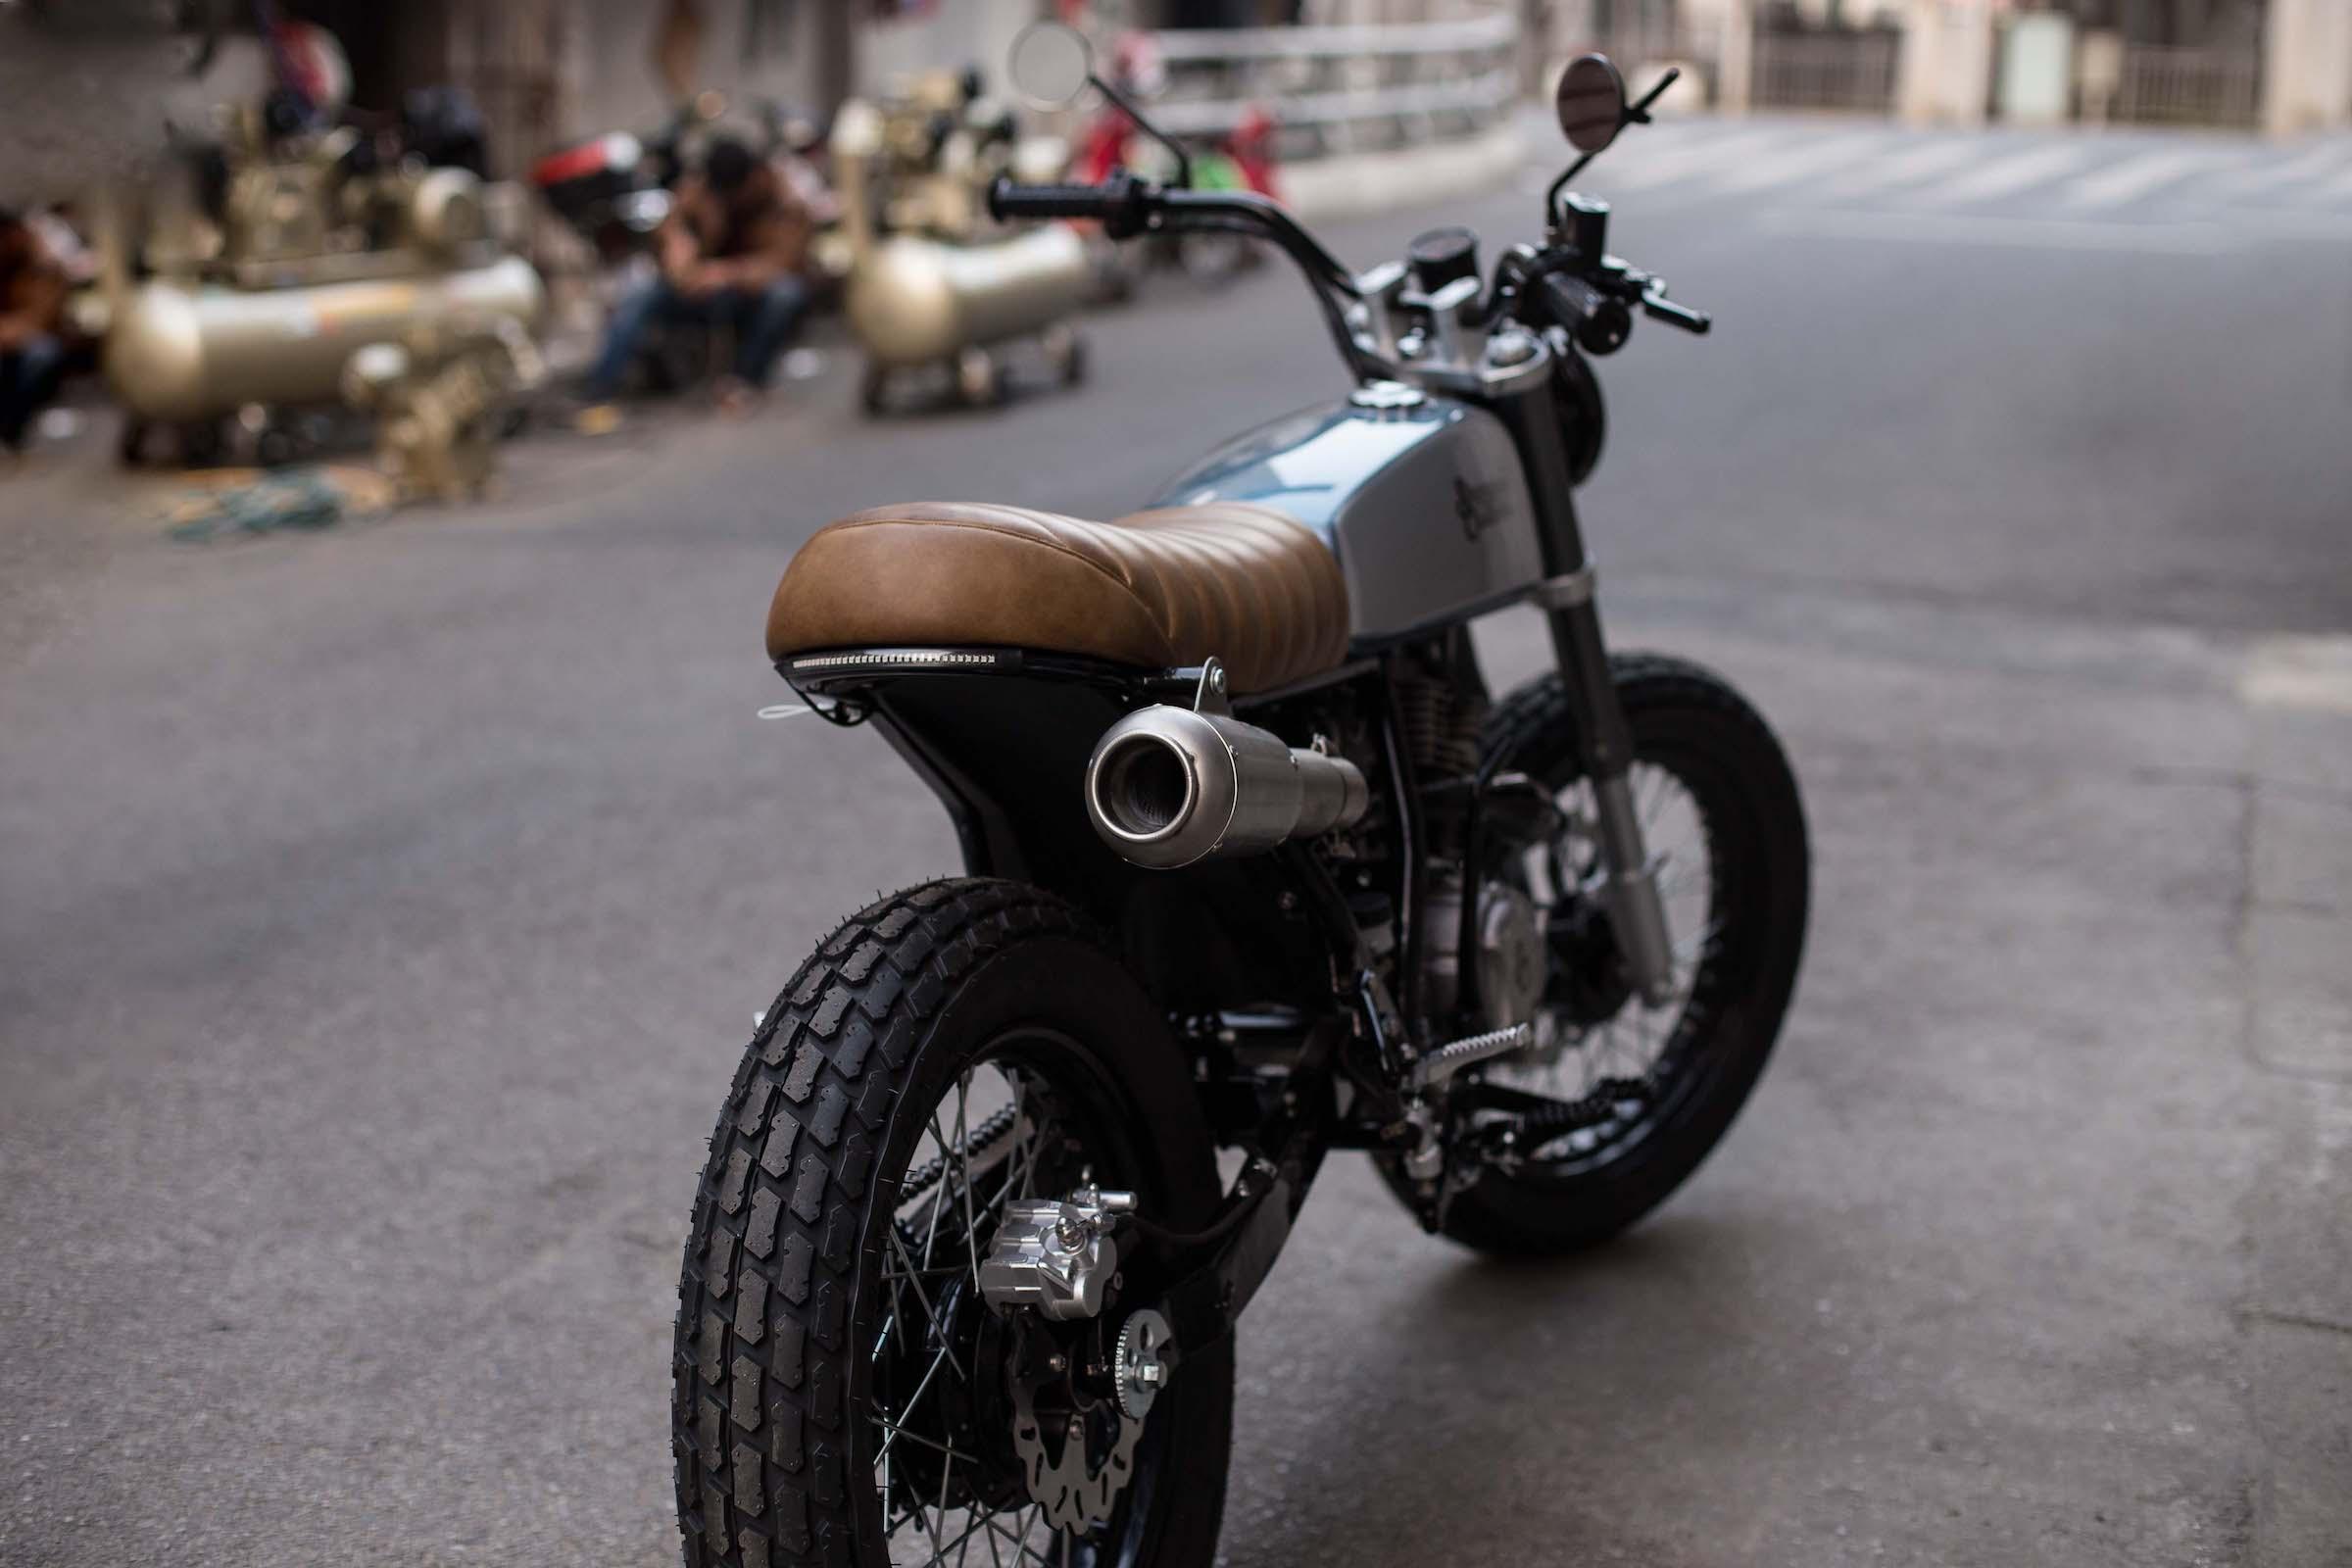 Ebay Motors Motorcycles >> Shanghai Customs Scrambler